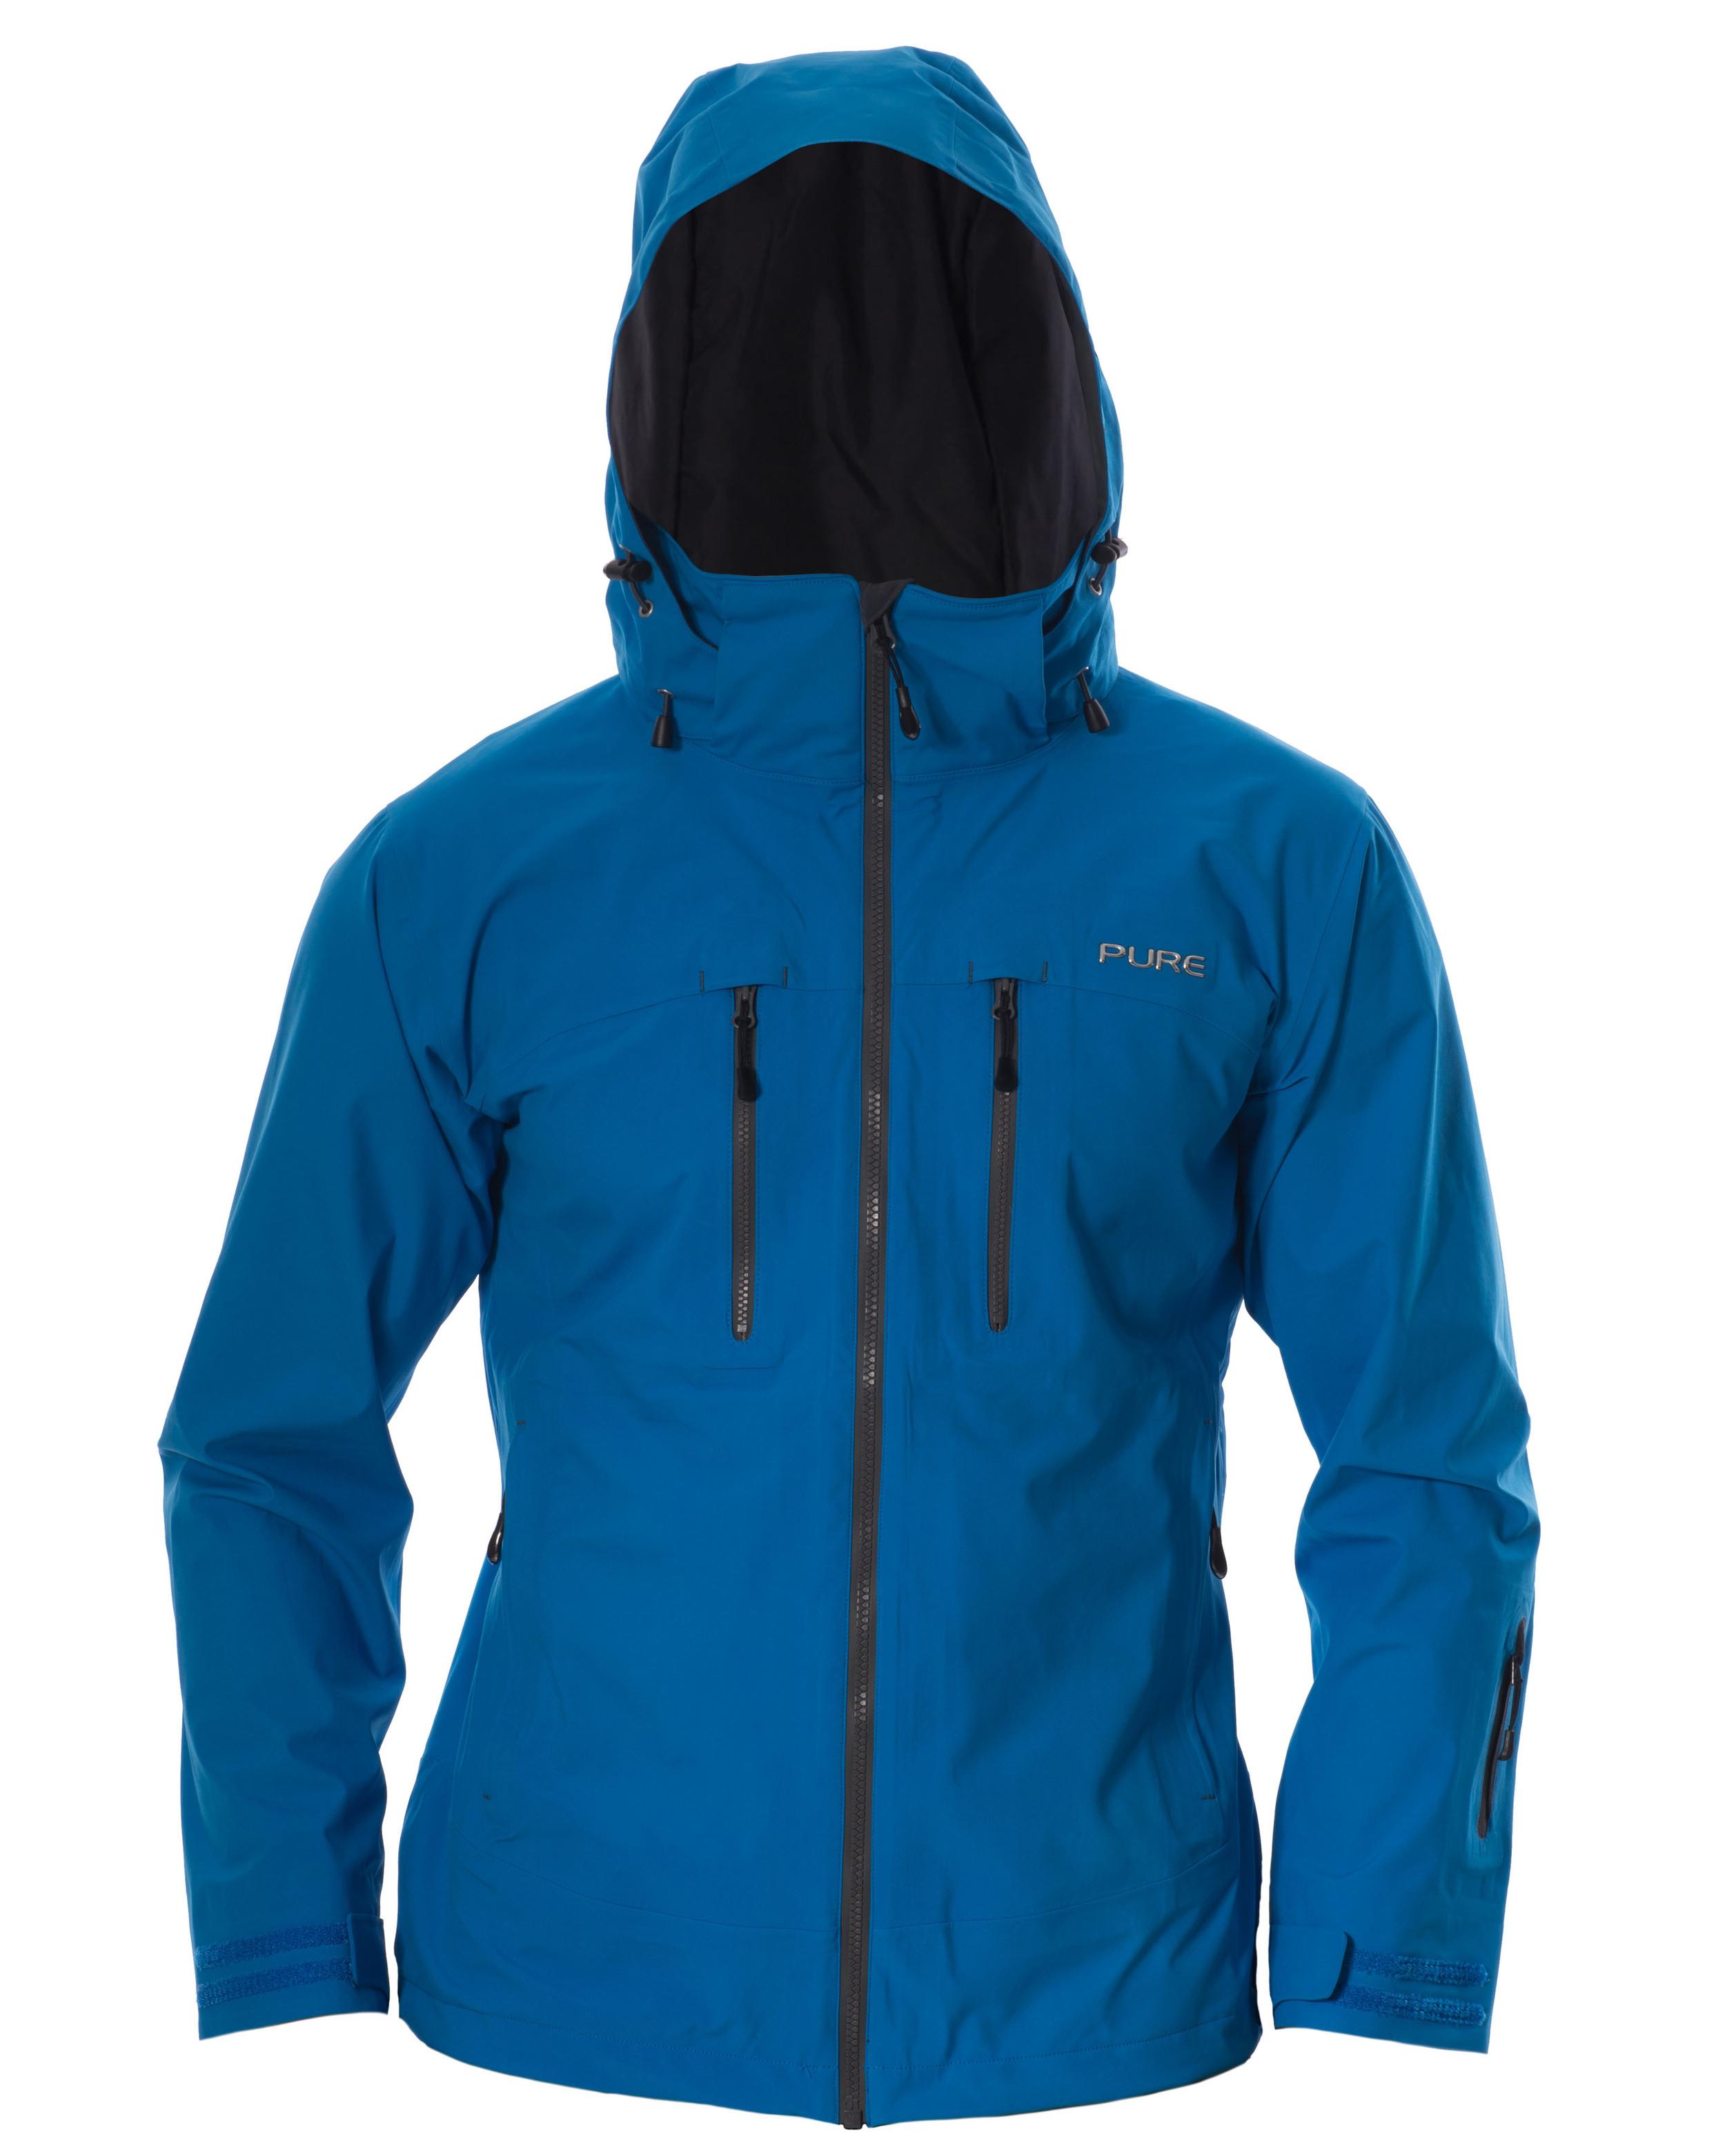 Copy of Everest Men's Jacket - Notice / Ebony Zips